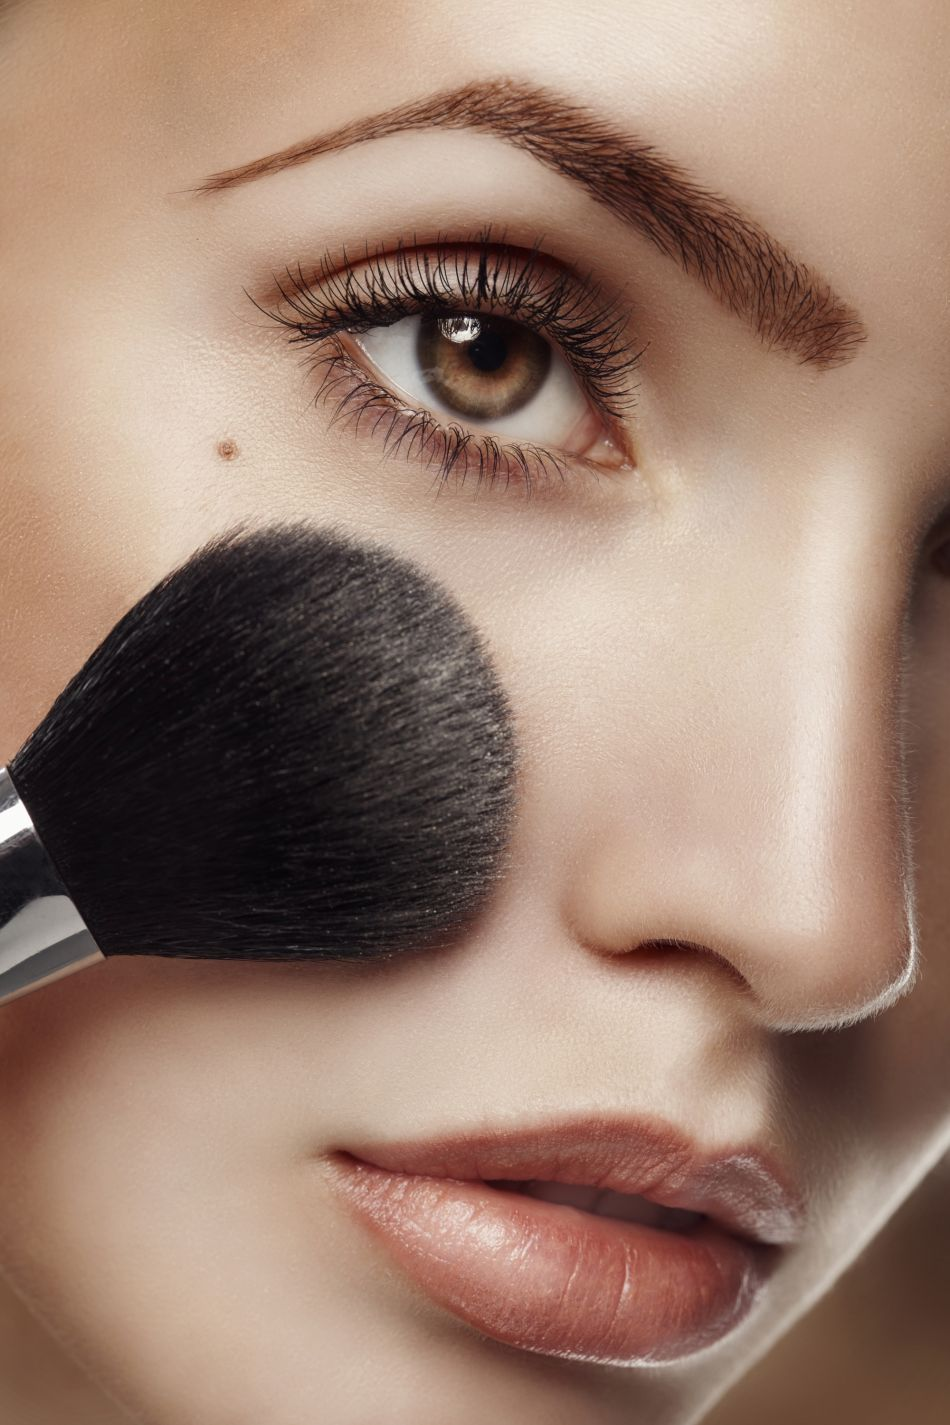 maquillage la zone o tester son fond de teint pour ne plus se tromper. Black Bedroom Furniture Sets. Home Design Ideas